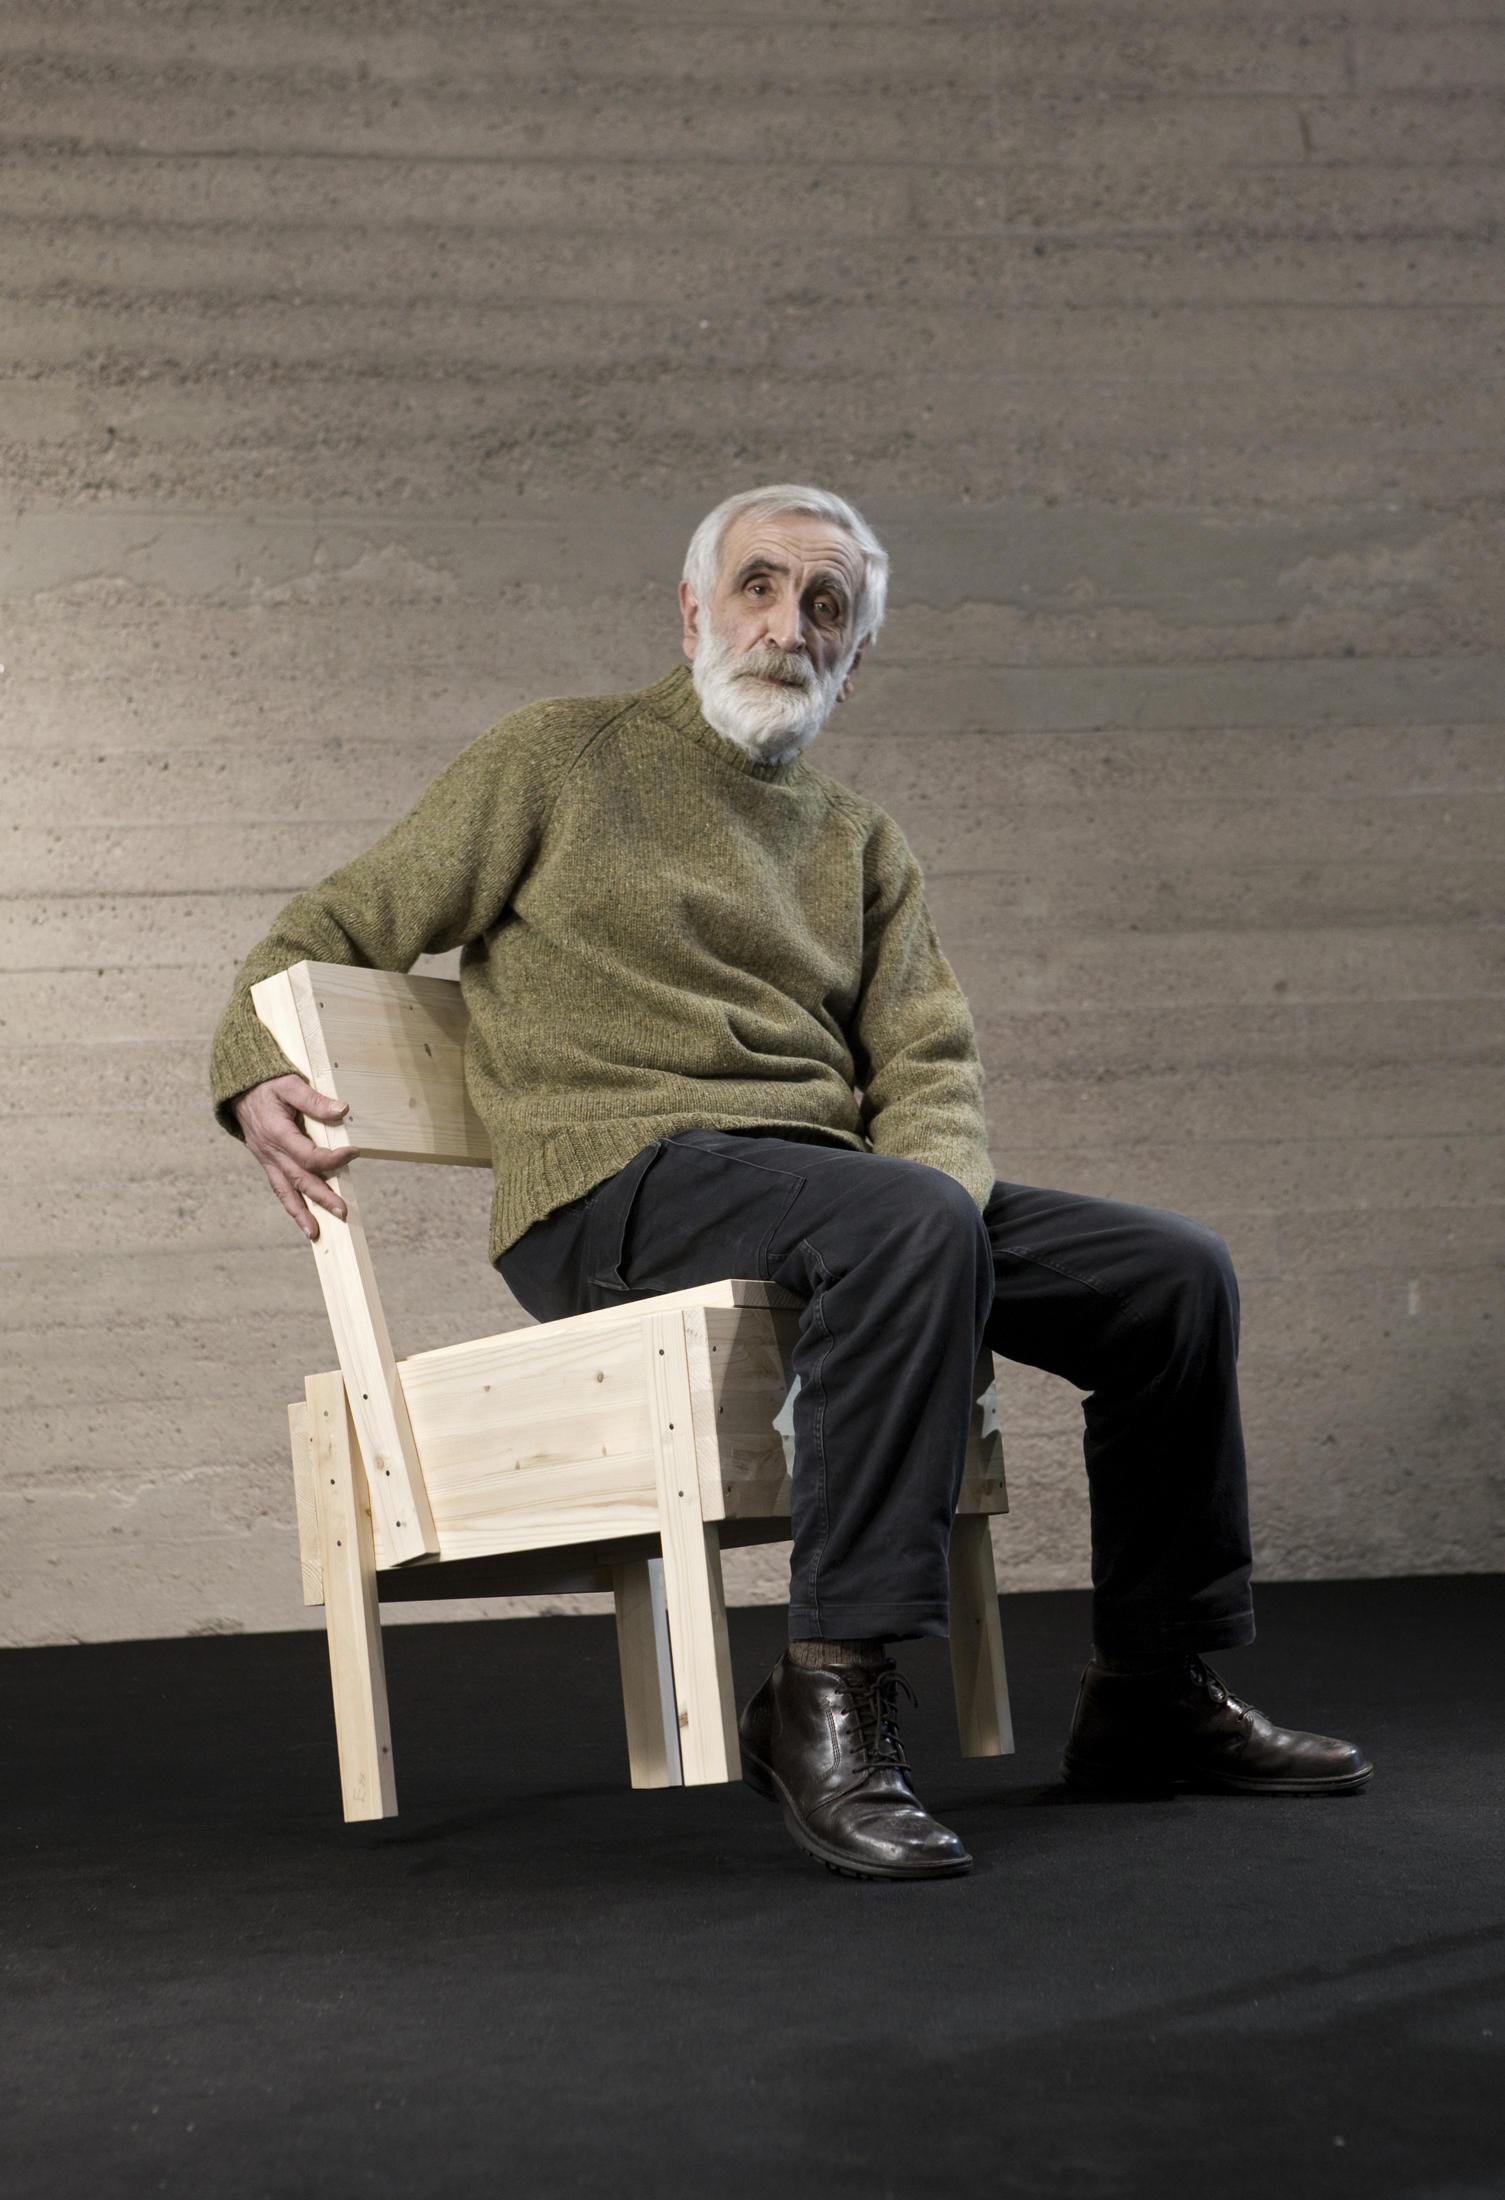 SEDIA 1 CHAIR Restaurant Chairs From Artek Architonic